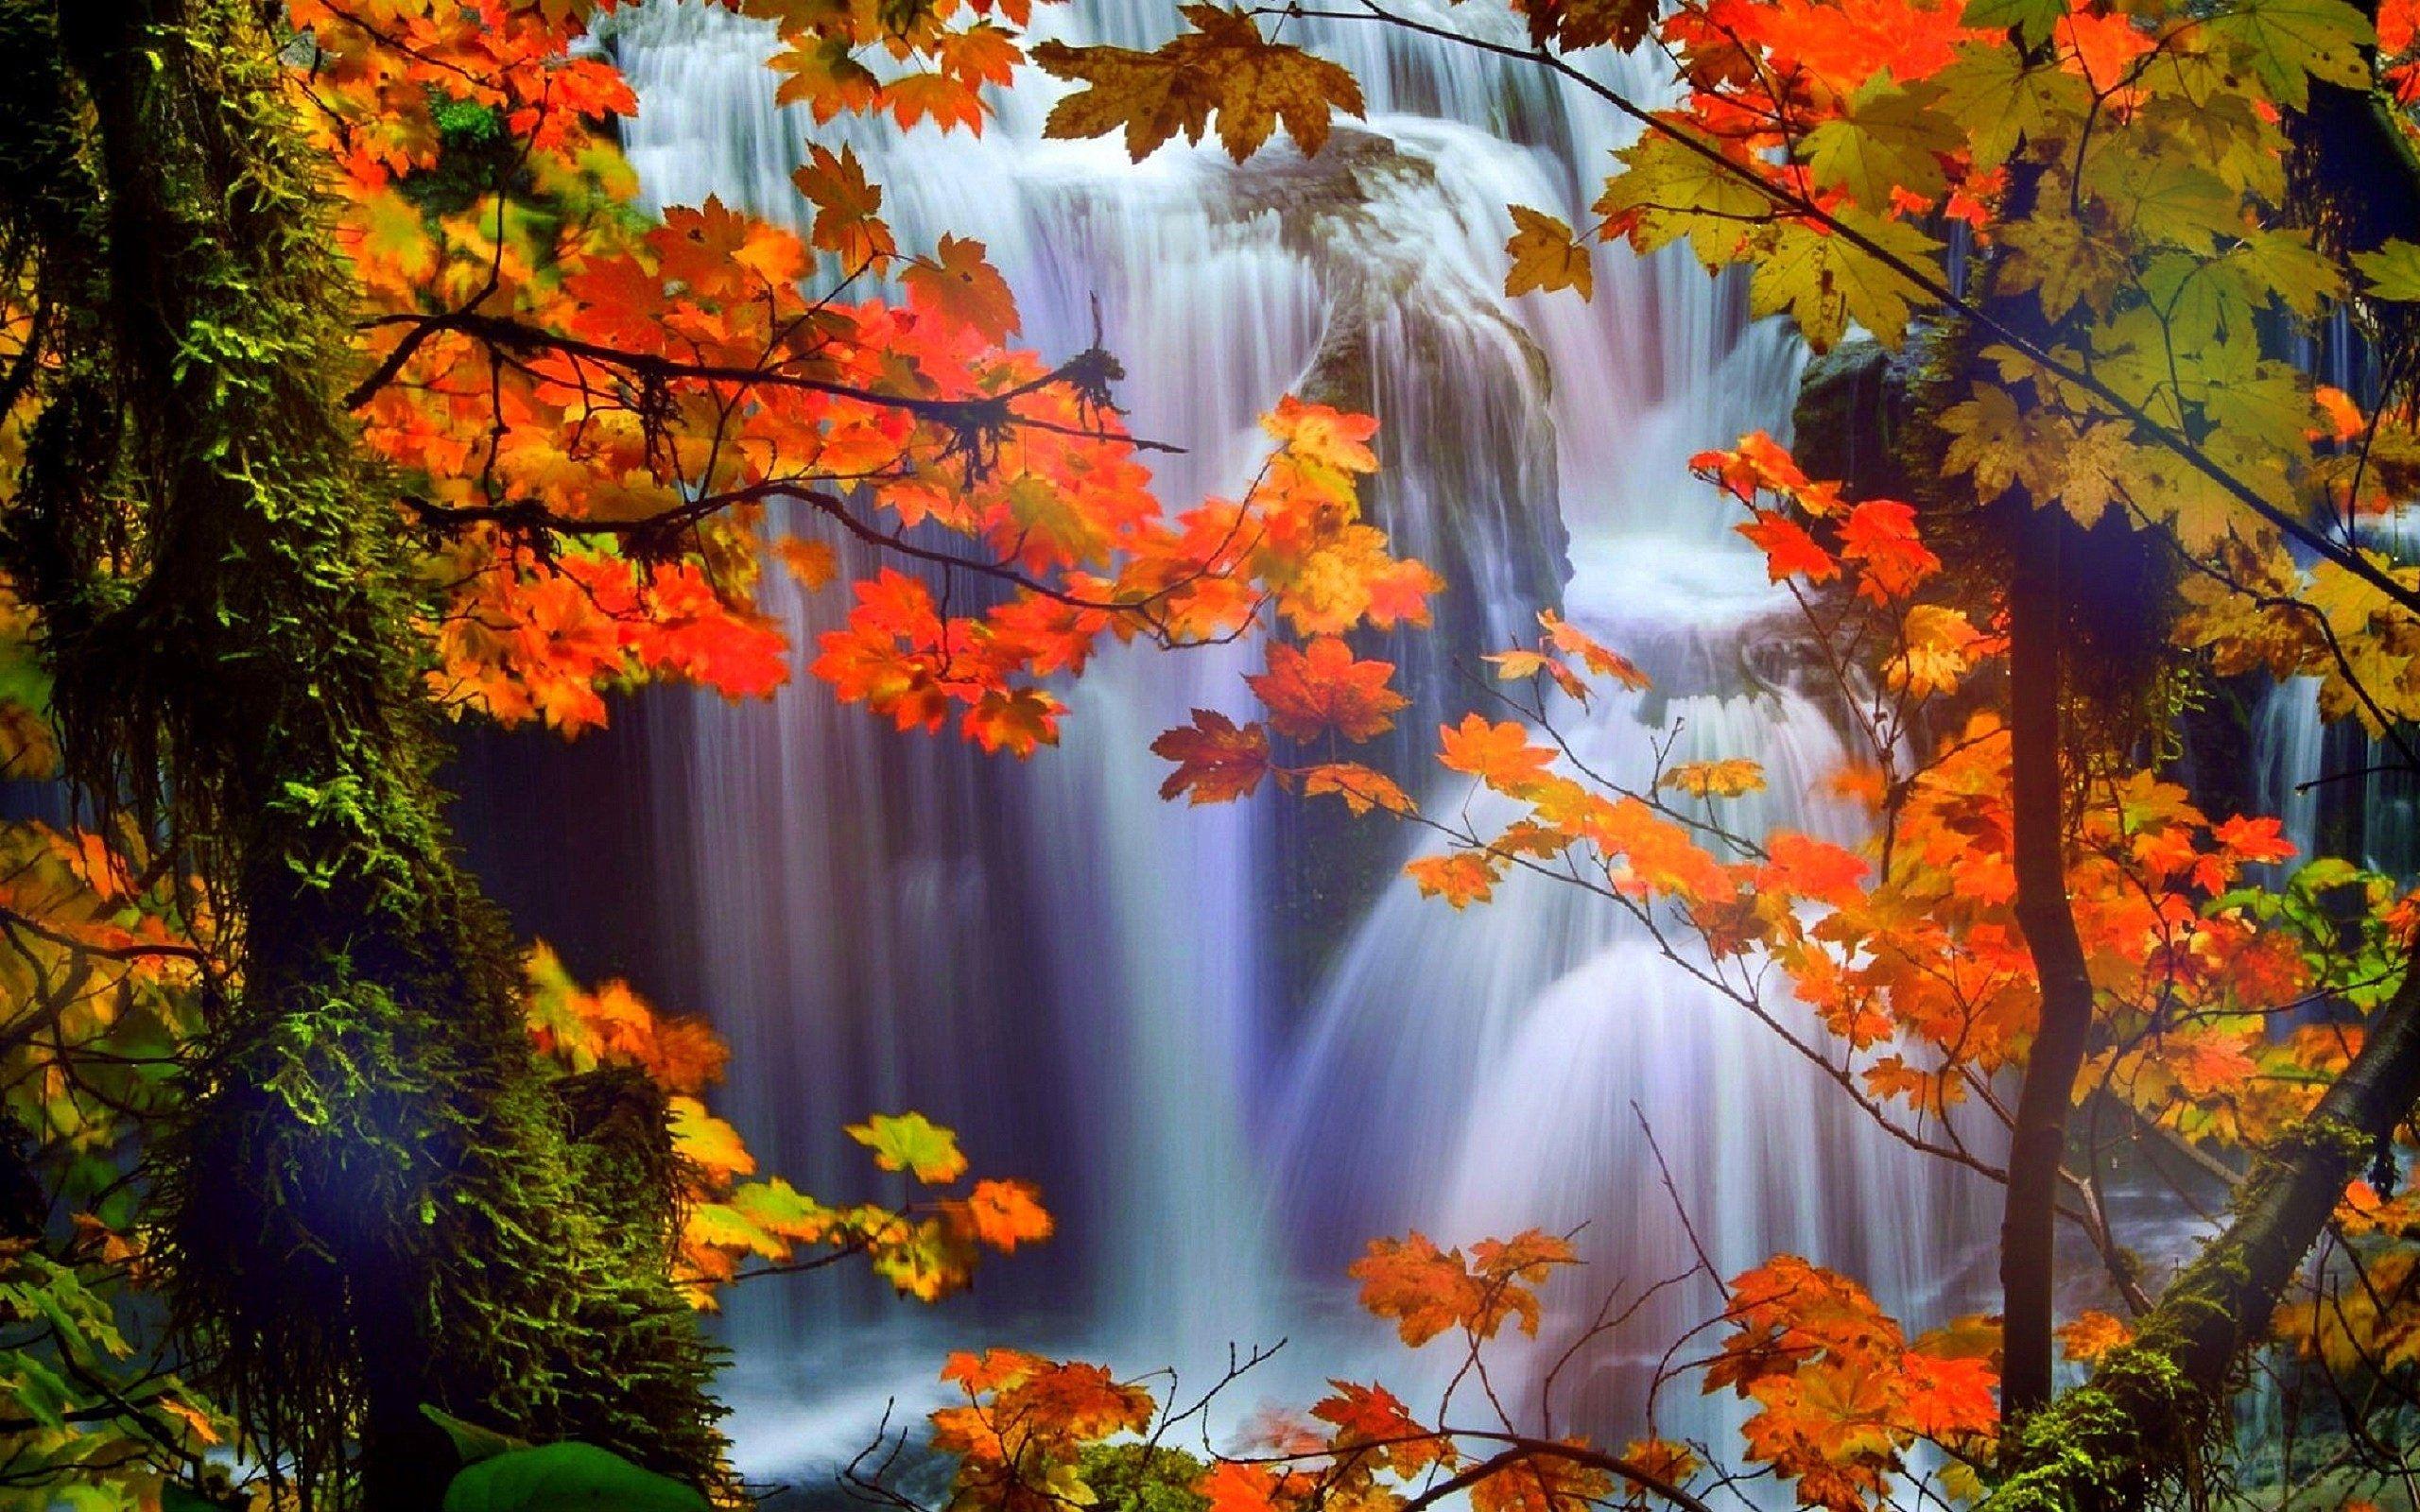 10 Most Popular Beautiful Fall Scenery Background Full Hd 1080p For Pc Background Fall Scenery Pictures Autumn Scenery Scenery Wallpaper